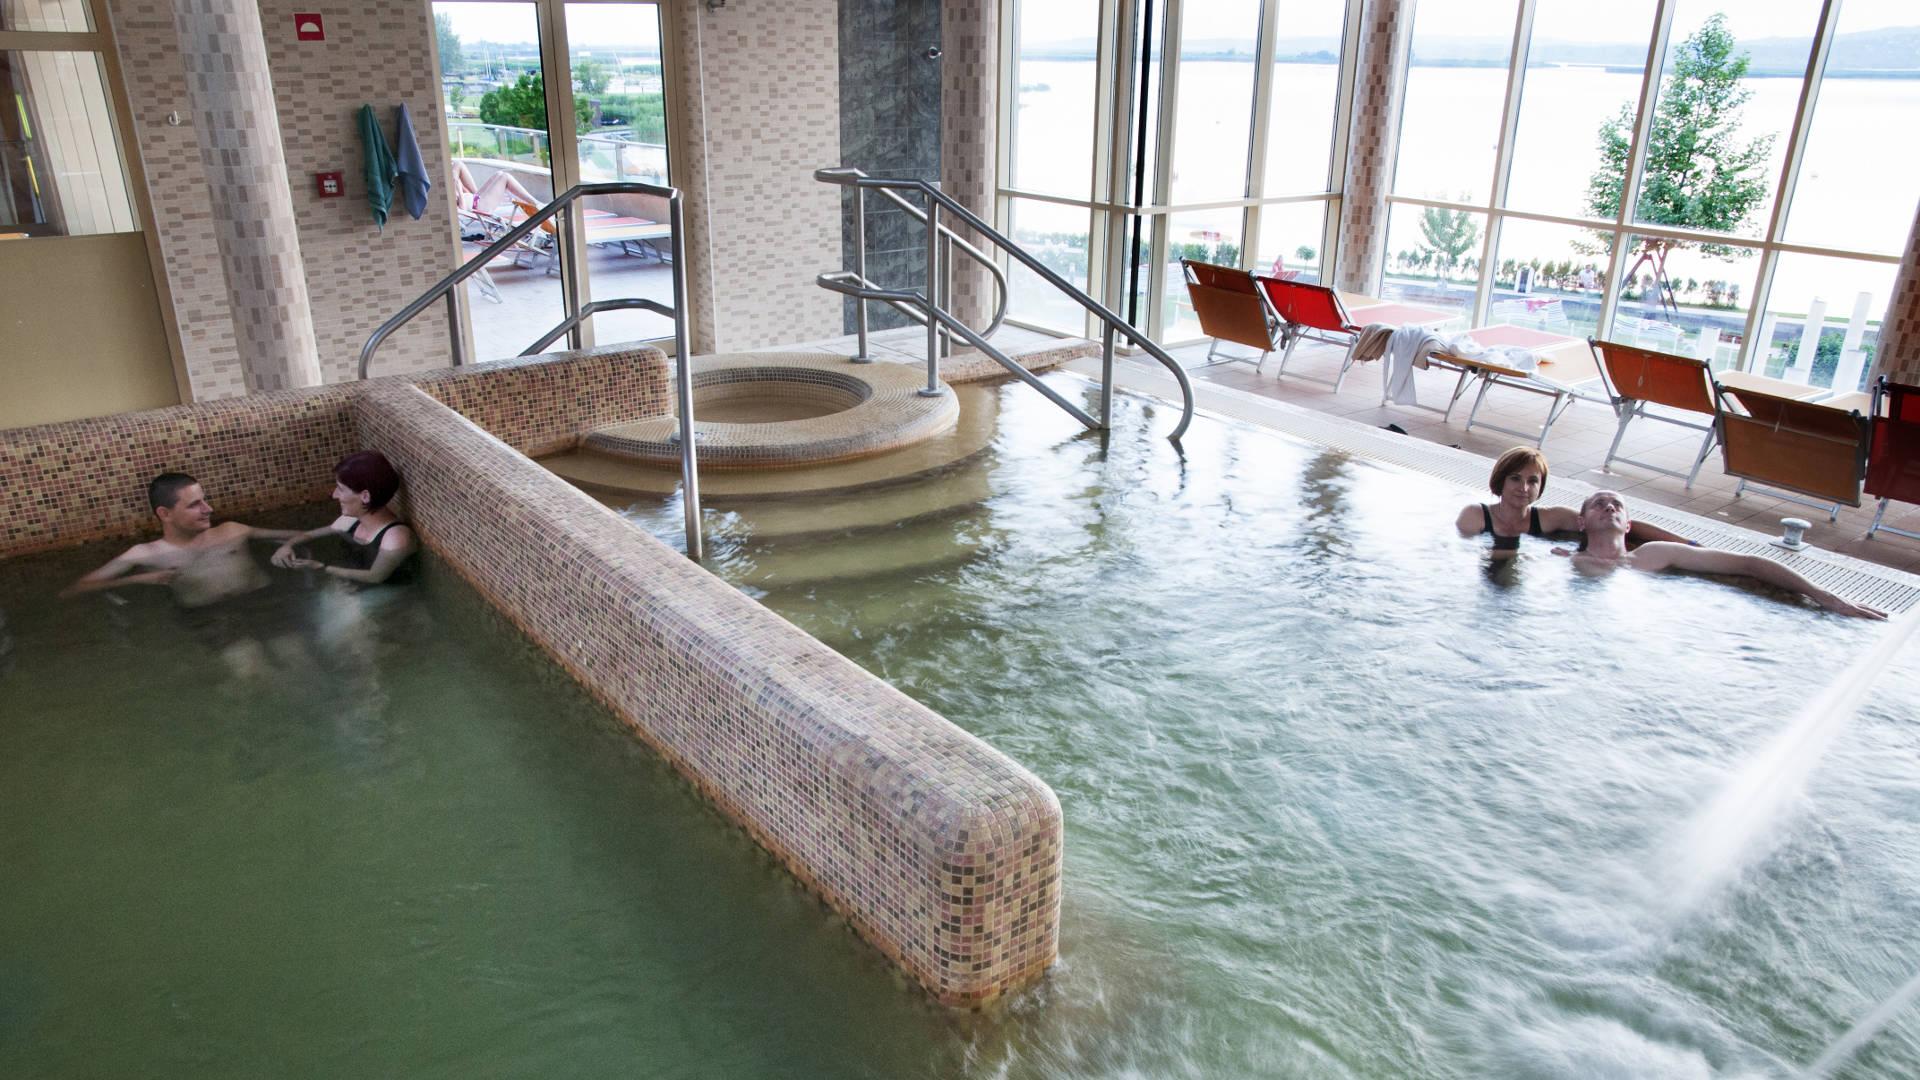 Velence Resort & Spa - Emeleti tópanorámás gyógyvizes medence